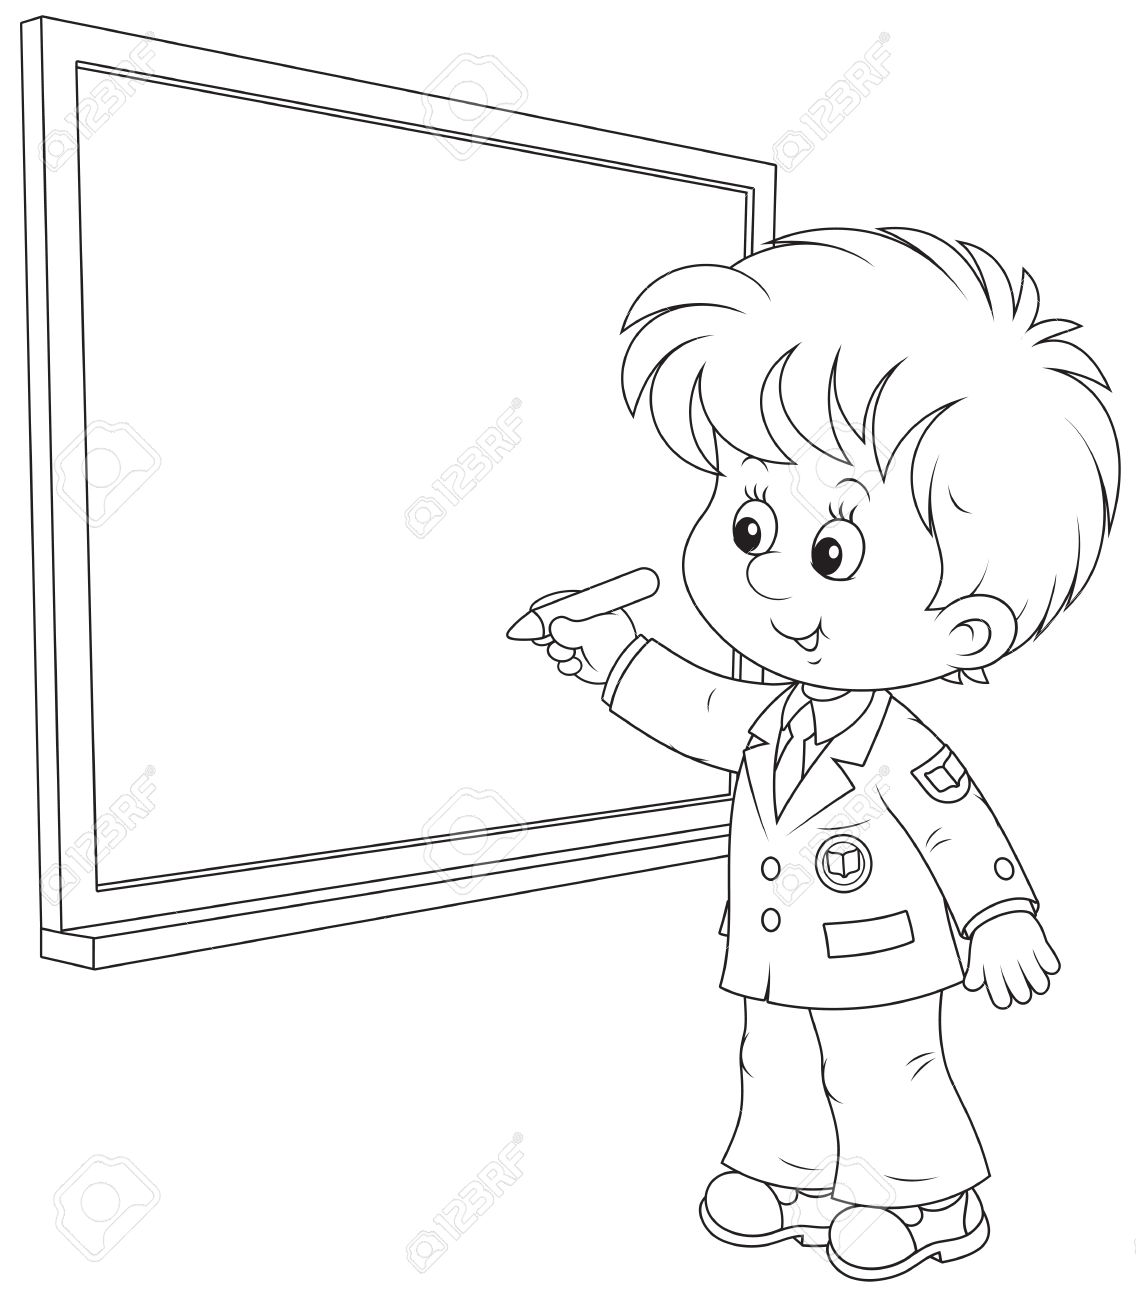 1136x1300 Schoolboy Writes On The Blackboard With Chalk Royalty Free